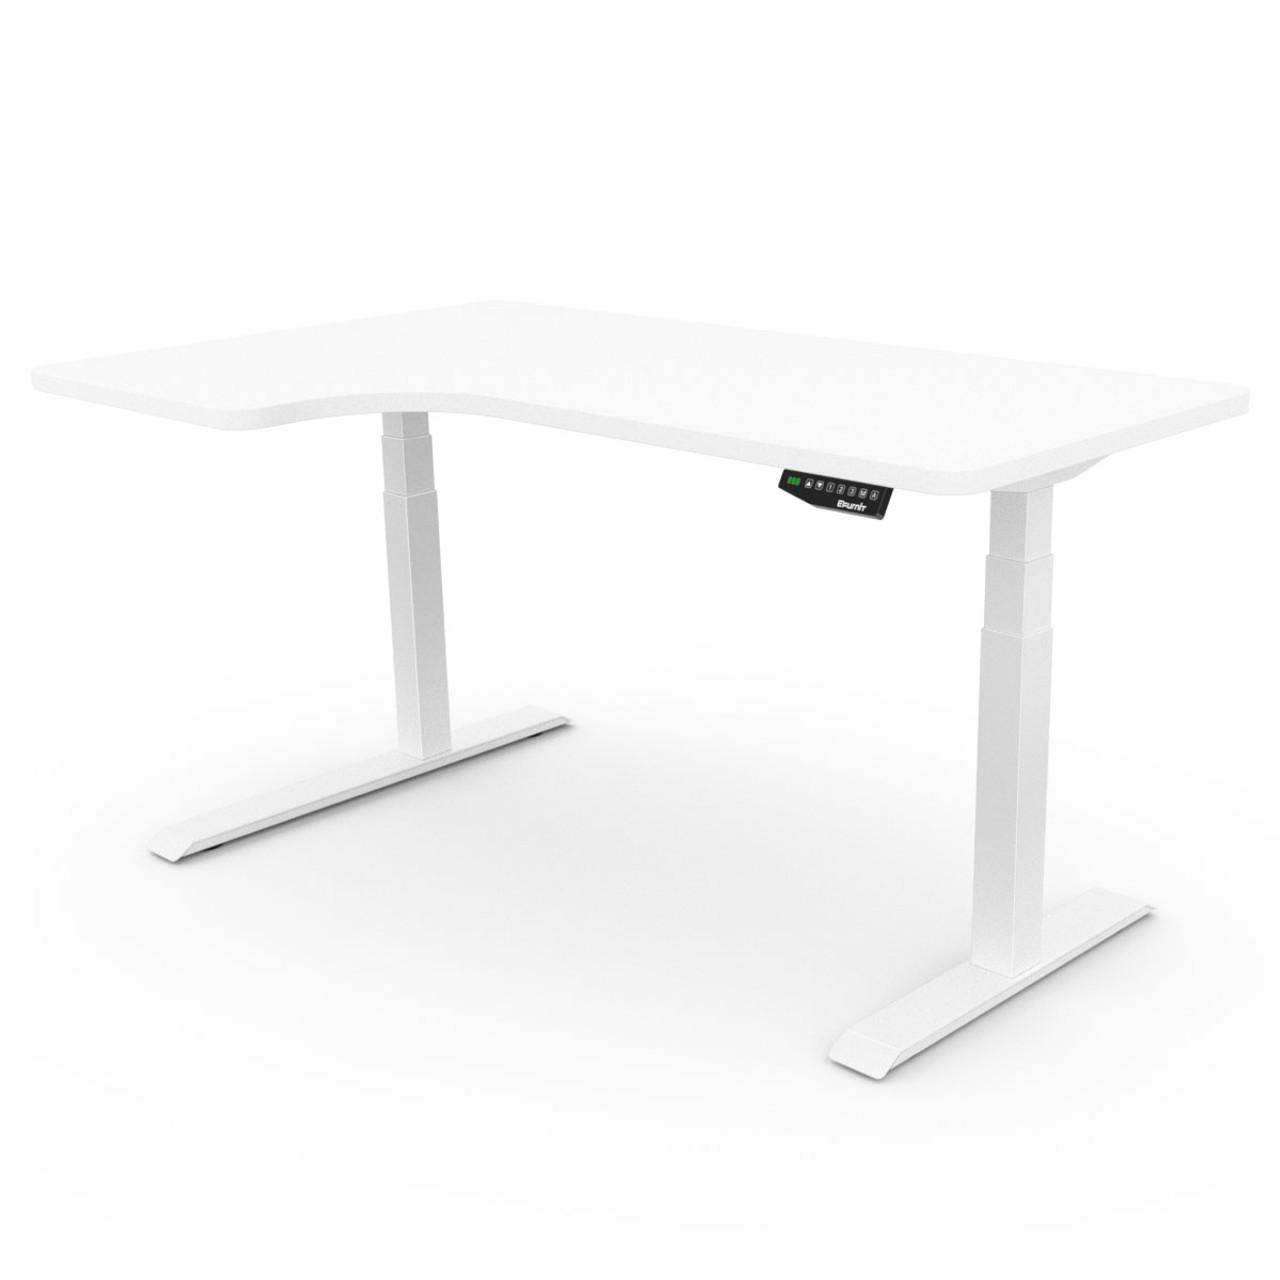 EFurnit Alpine Corner Standing Desk , Dual motor